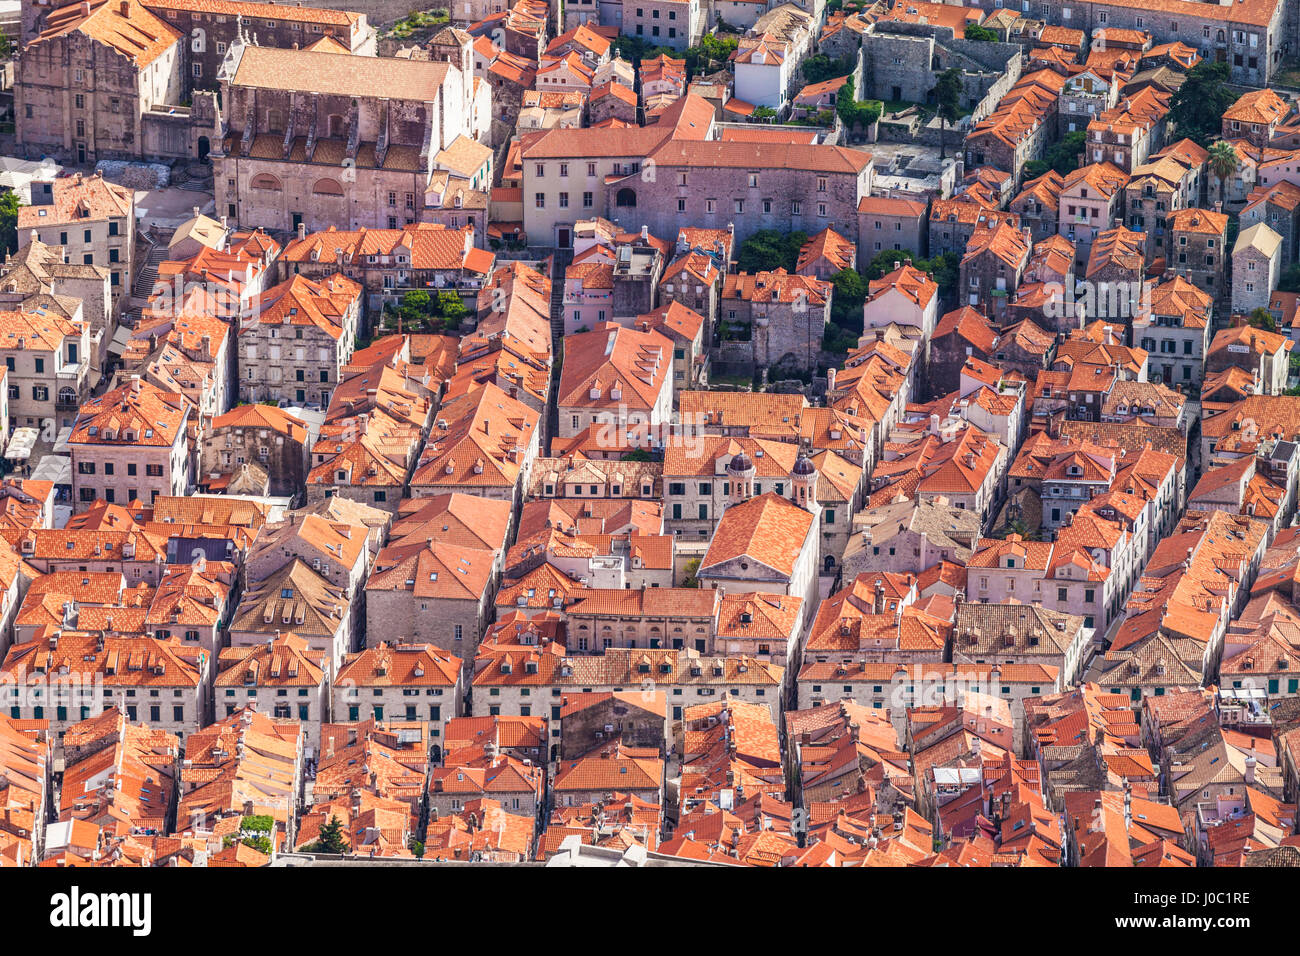 Aerial rooftop view of Dubrovnik Old Town, UNESCO World Heritage Site, Dubrovnik, Dalmatian Coast, Croatia - Stock Image